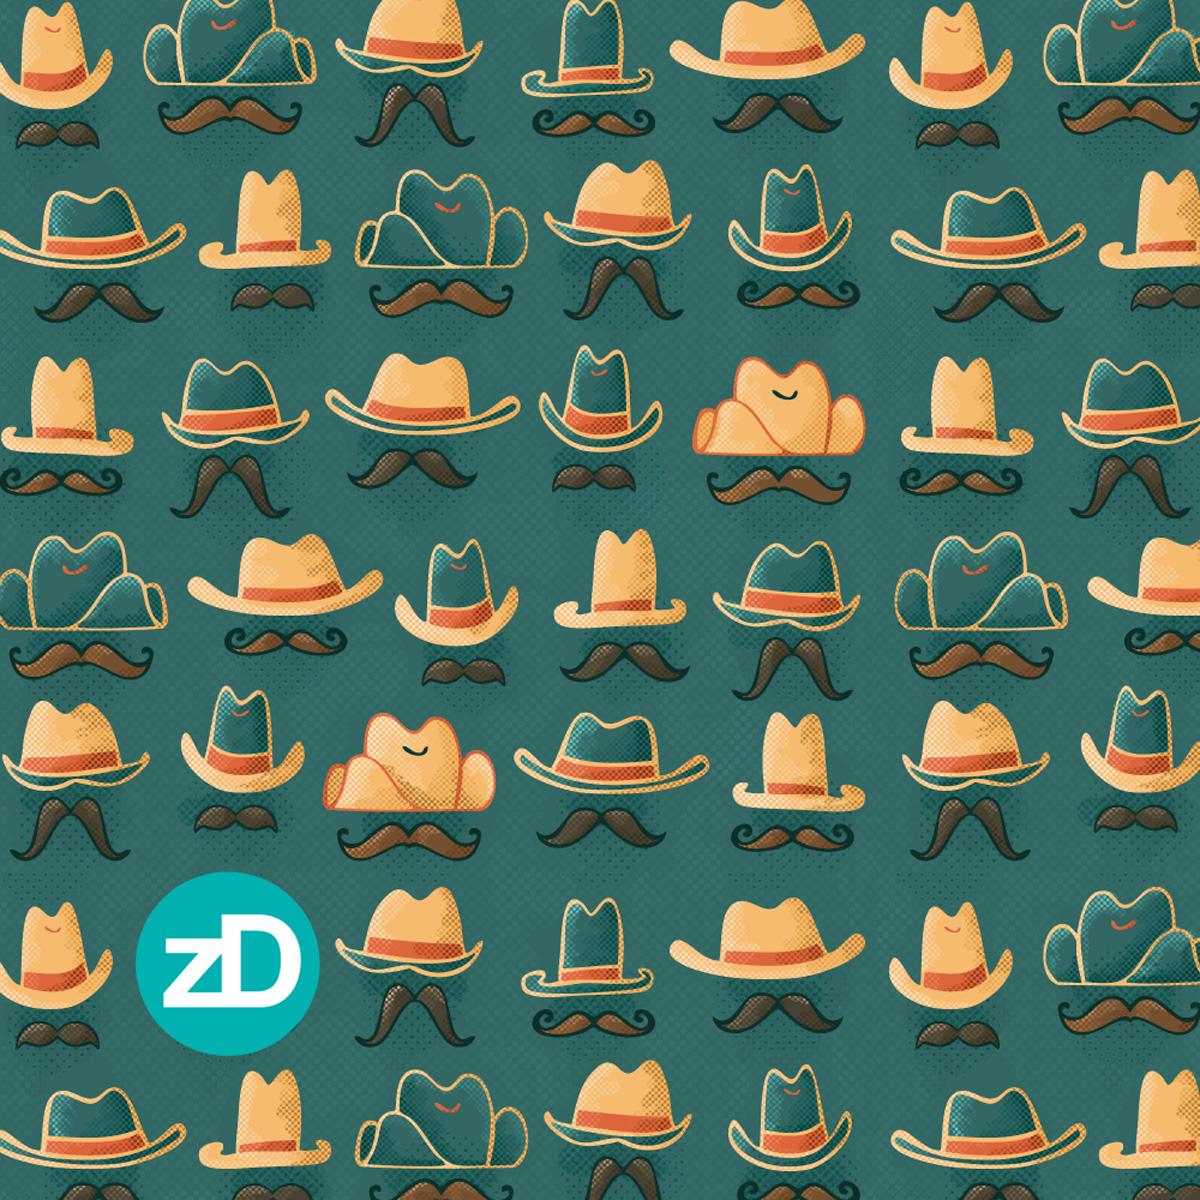 Zirkus Design | Cody Arizona Wild West Pattern Collection : Hats + Mustaches // Teal, Turquoise, Orange, Gold